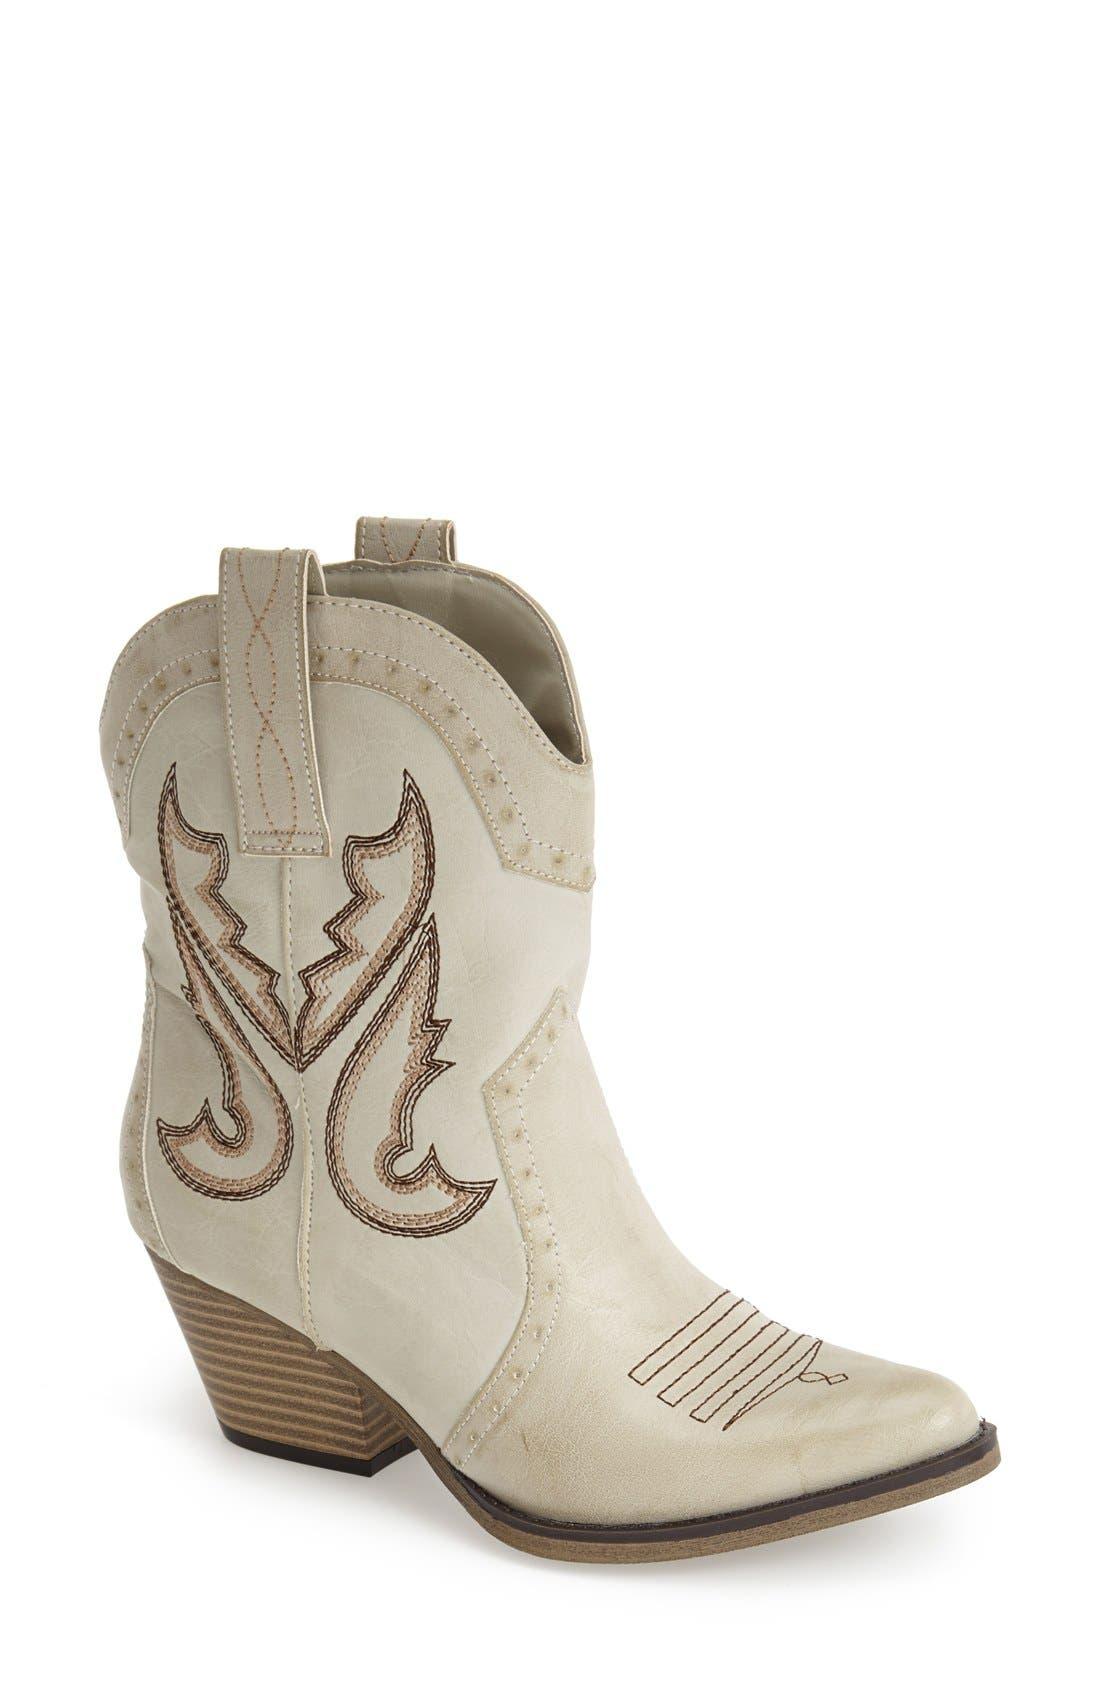 Main Image - MIA 'Horseback' Western Bootie (Women)